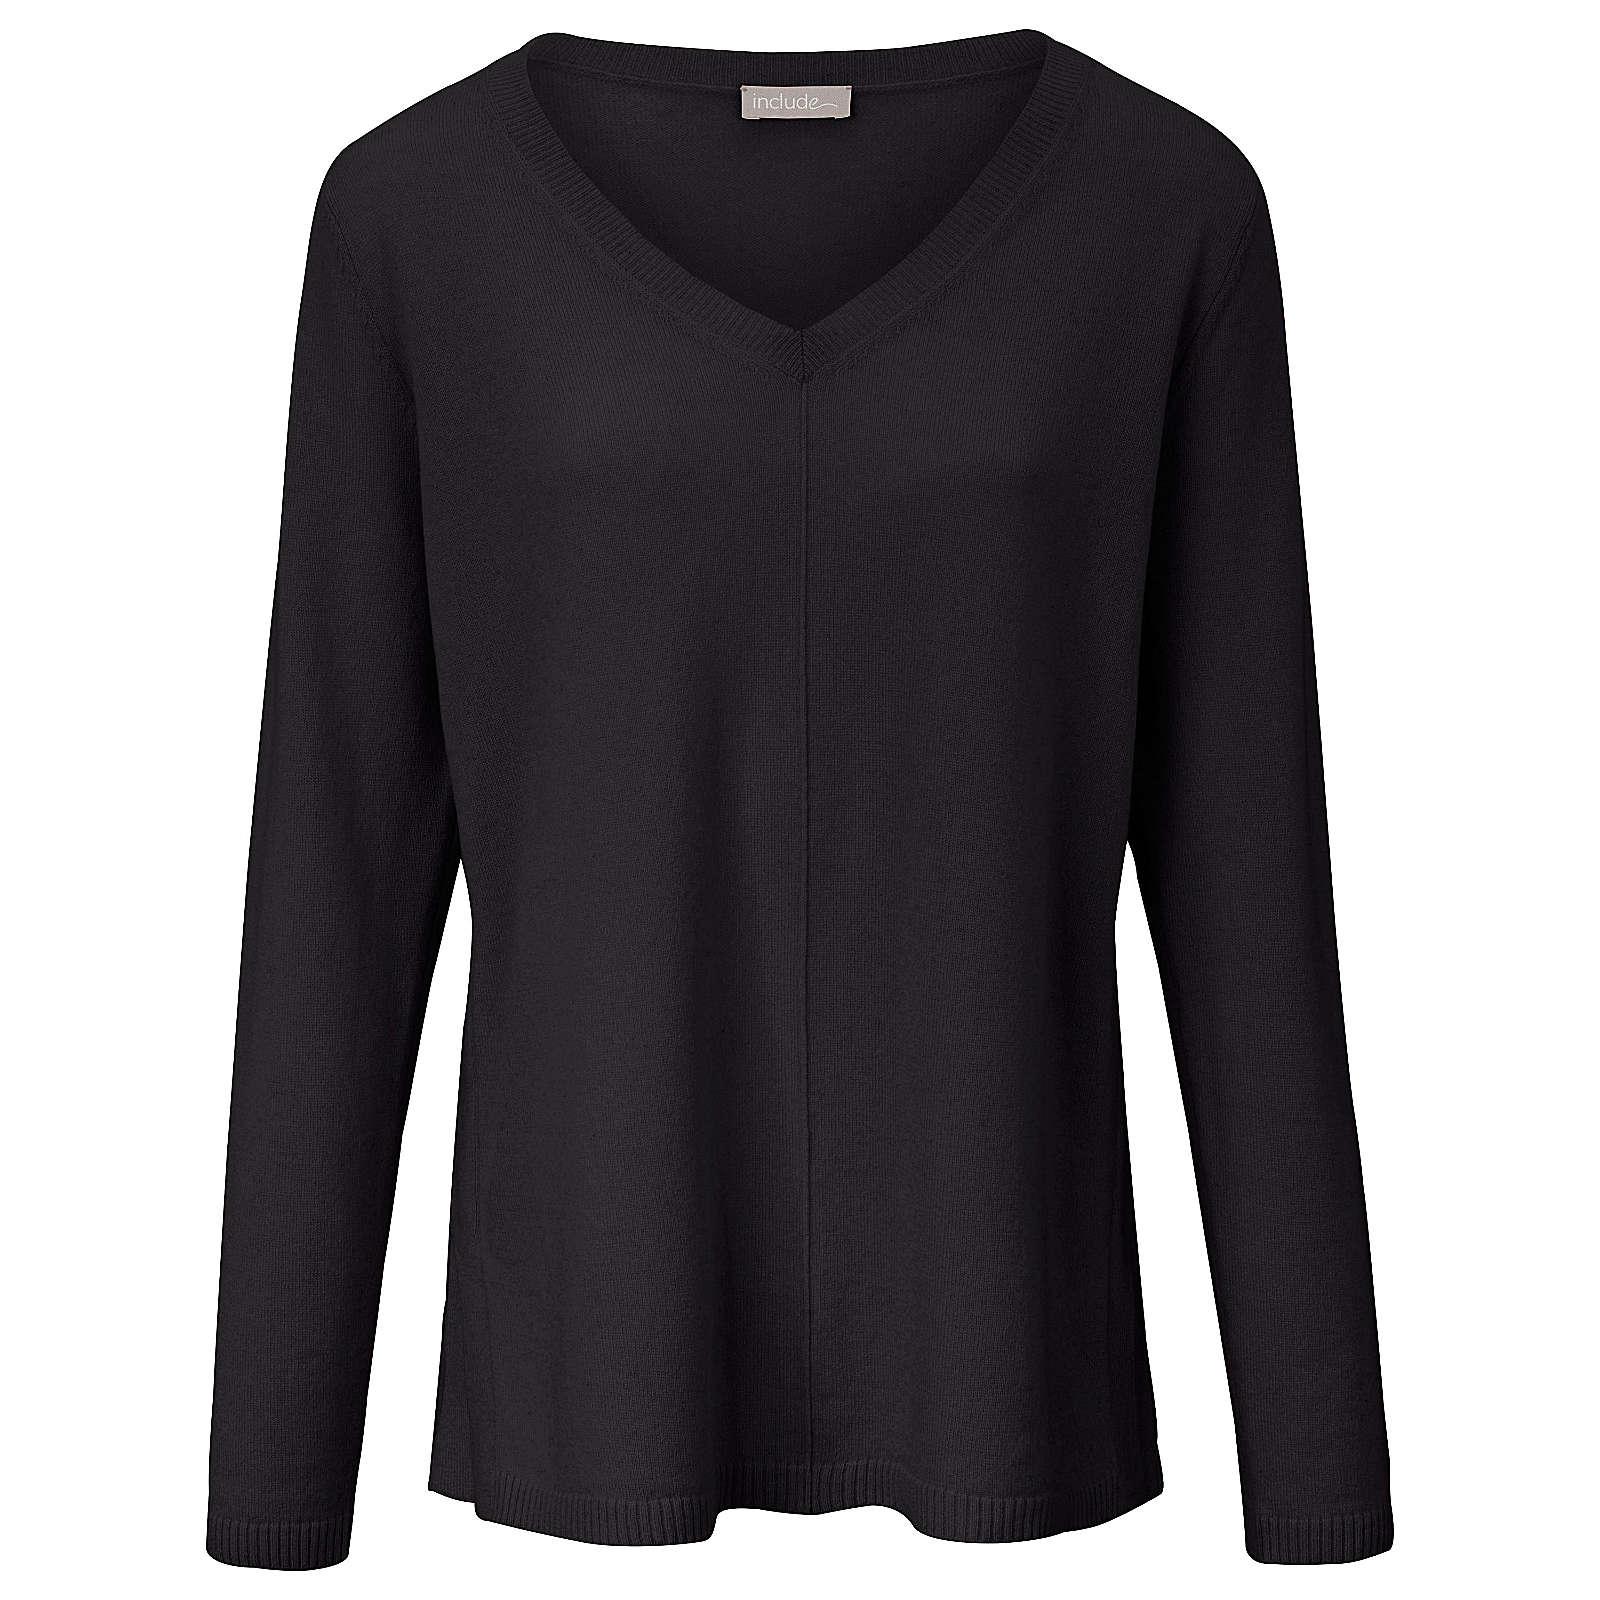 Include V-Pullover V-Pullover aus 100% Kaschmir Pullover schwarz Damen Gr. 48